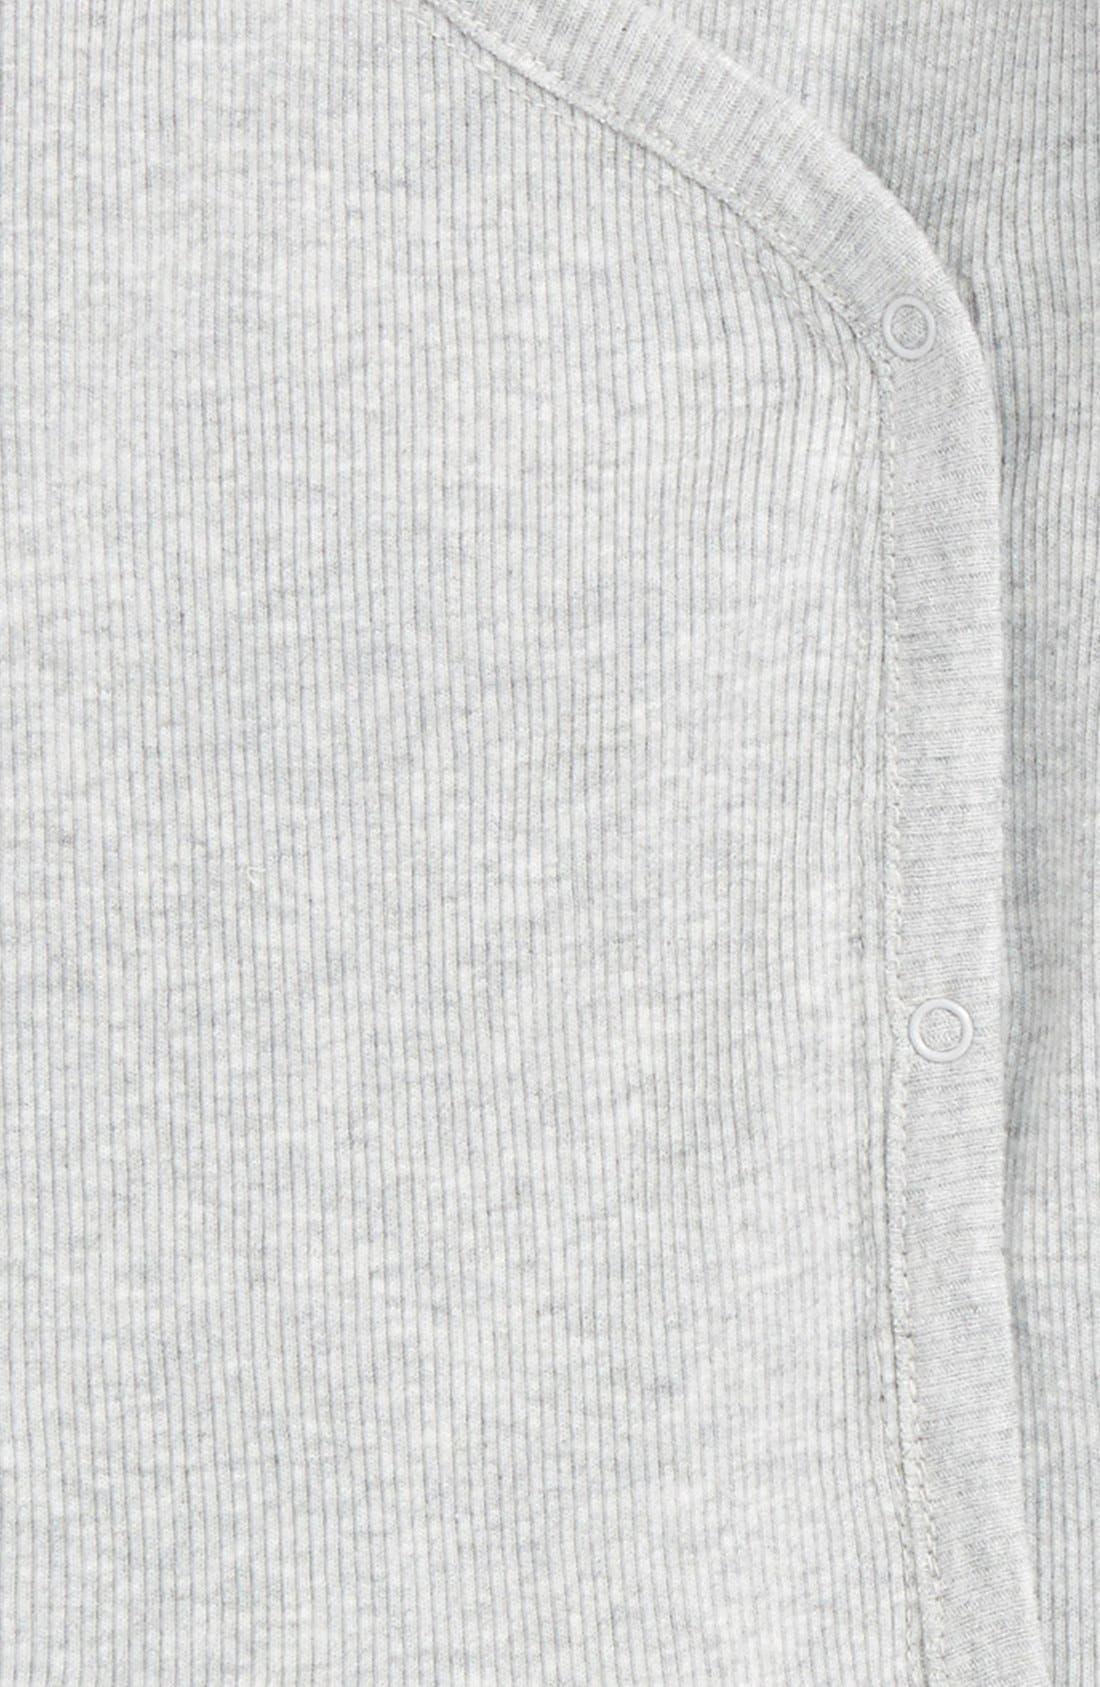 NORDSTROM BABY, Rib Knit T-Shirt & Pants Set, Alternate thumbnail 2, color, GREY ASH HEATHER